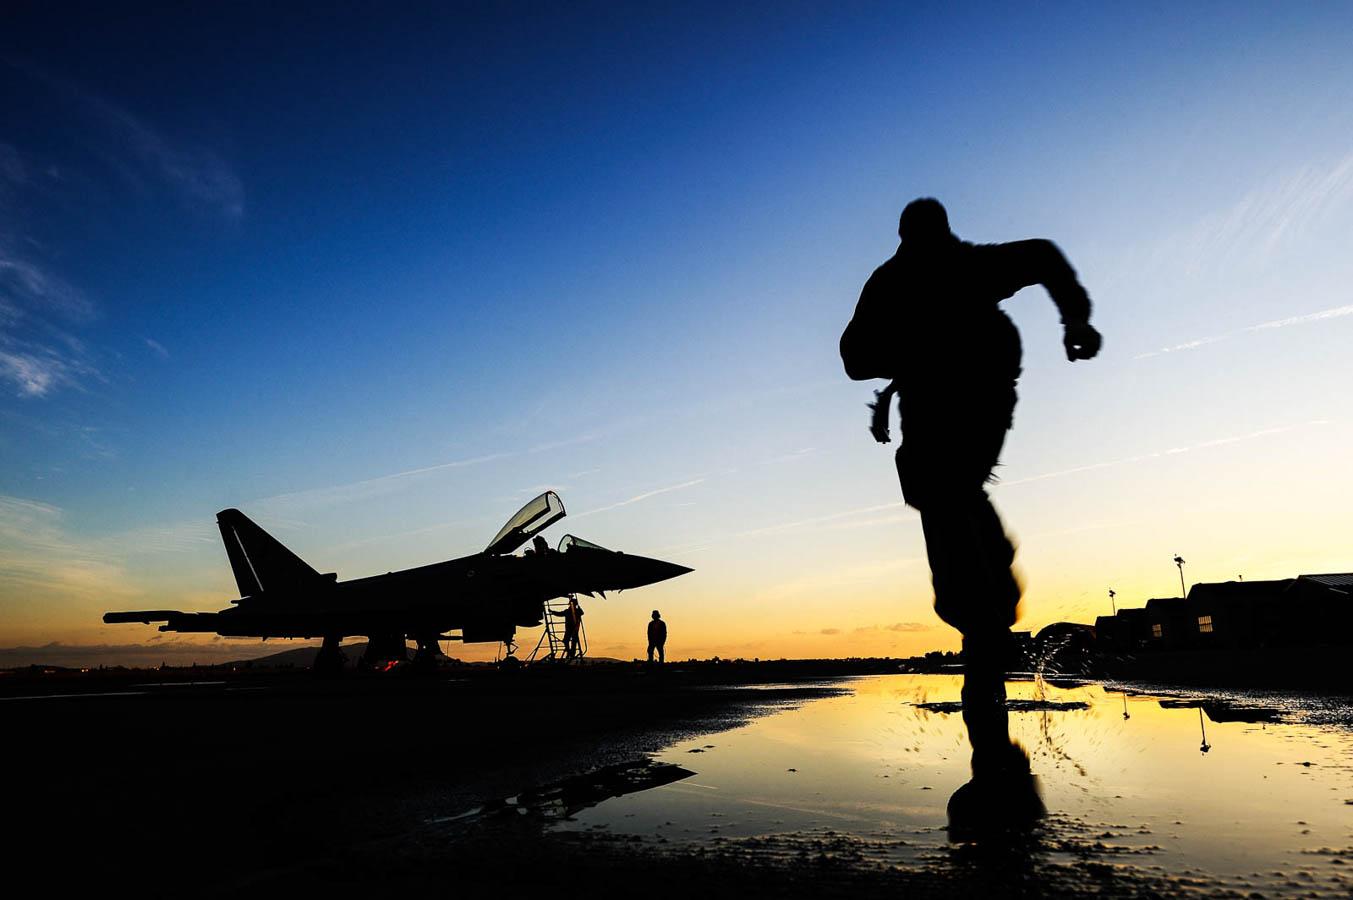 Eurofighter scramble - 4° Stormo Grosseto - Aeronautica Militare